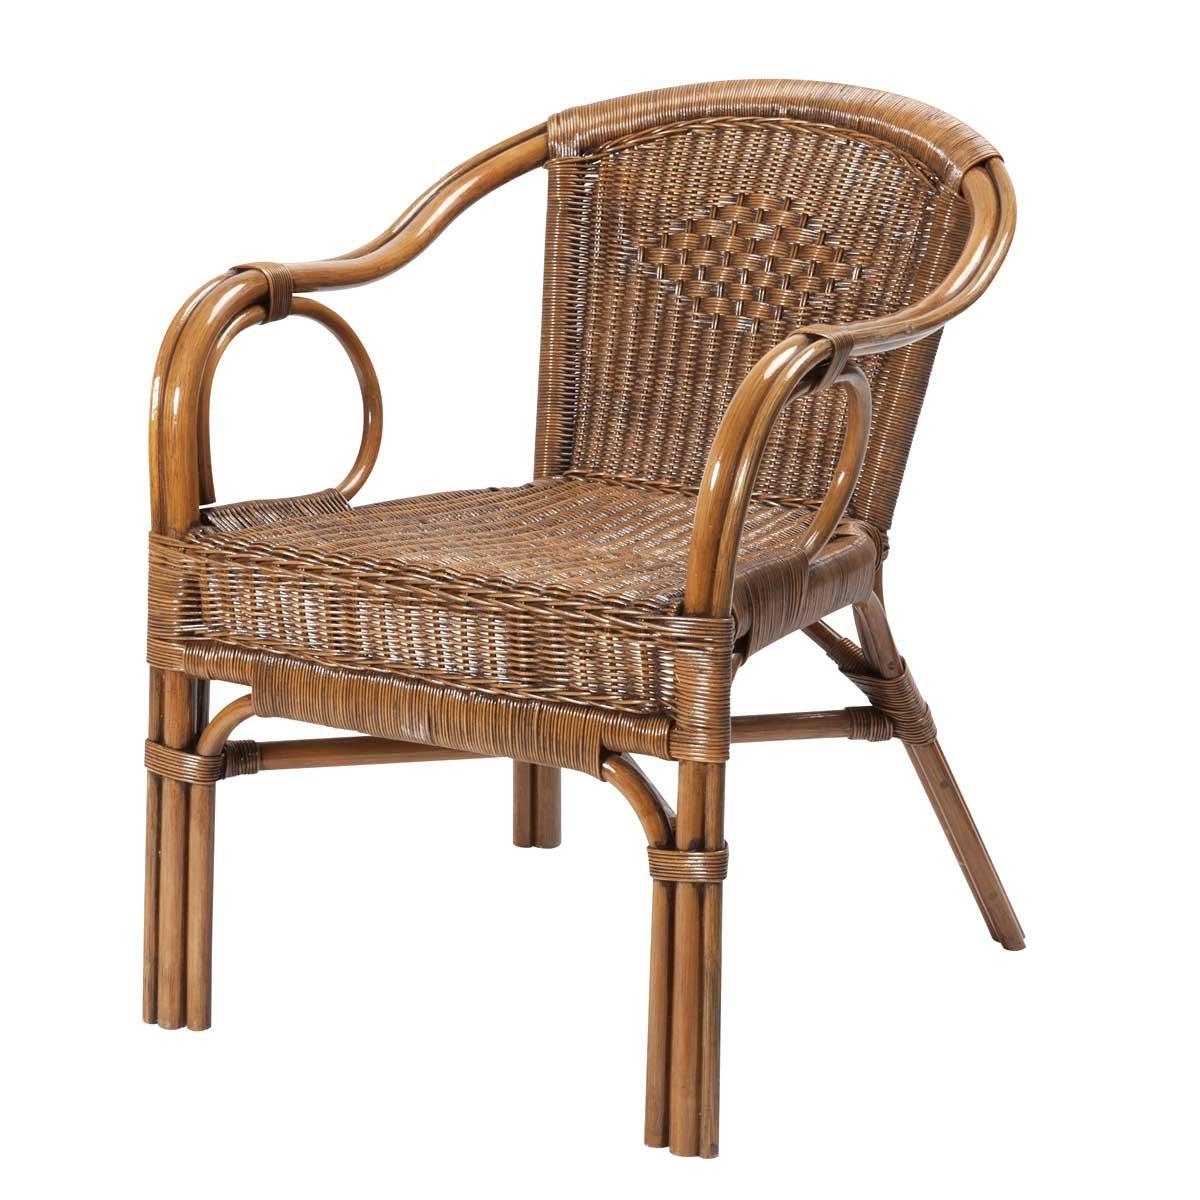 Rattan-Sessel PALMA - Korbsessel - handgeflochten - Bernsteinfarben Braun